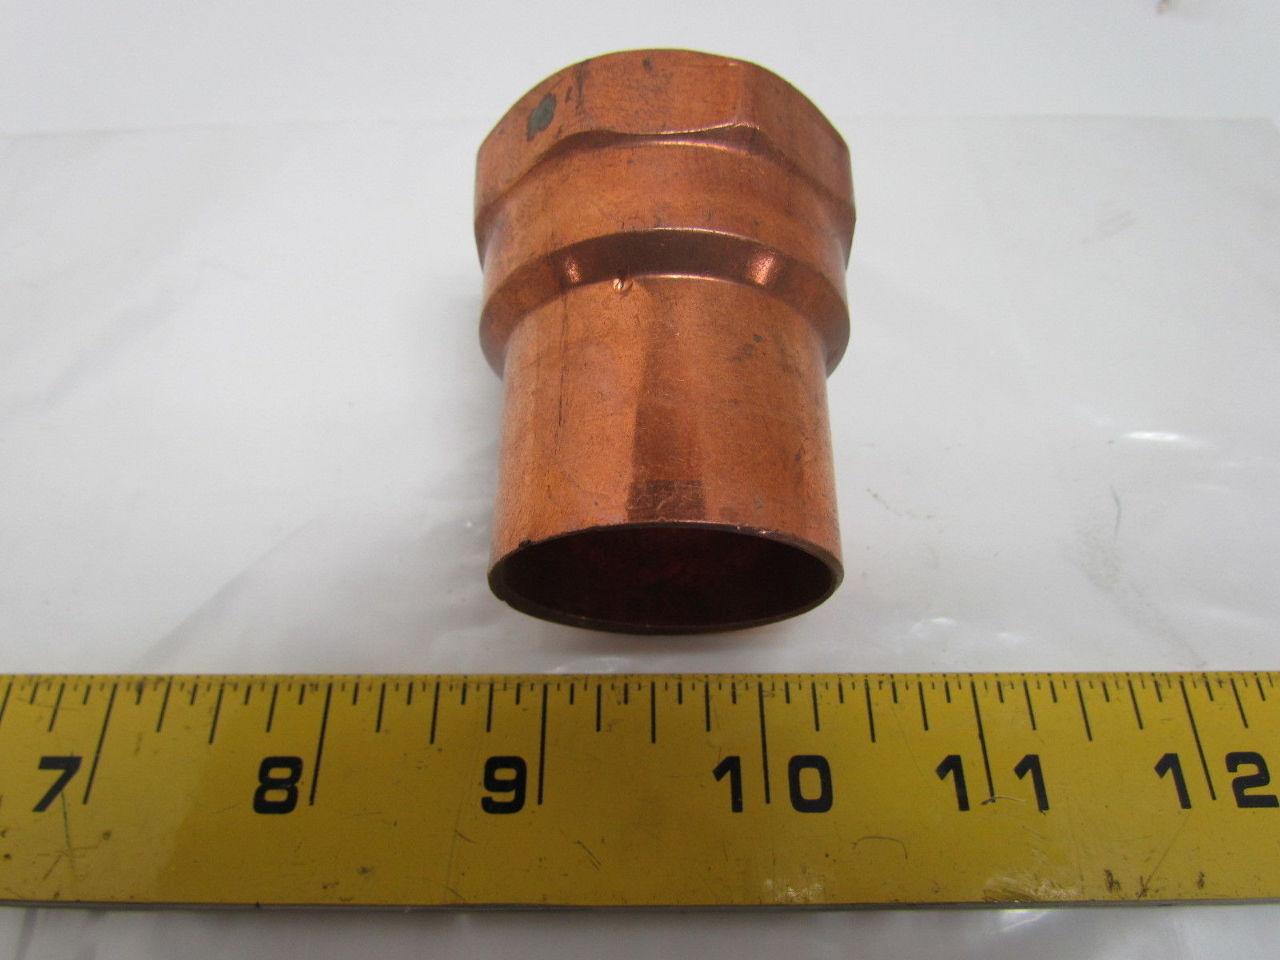 Epc 46000 303 1 1 4 Quot Female Adaptor Wrot Copper Solder